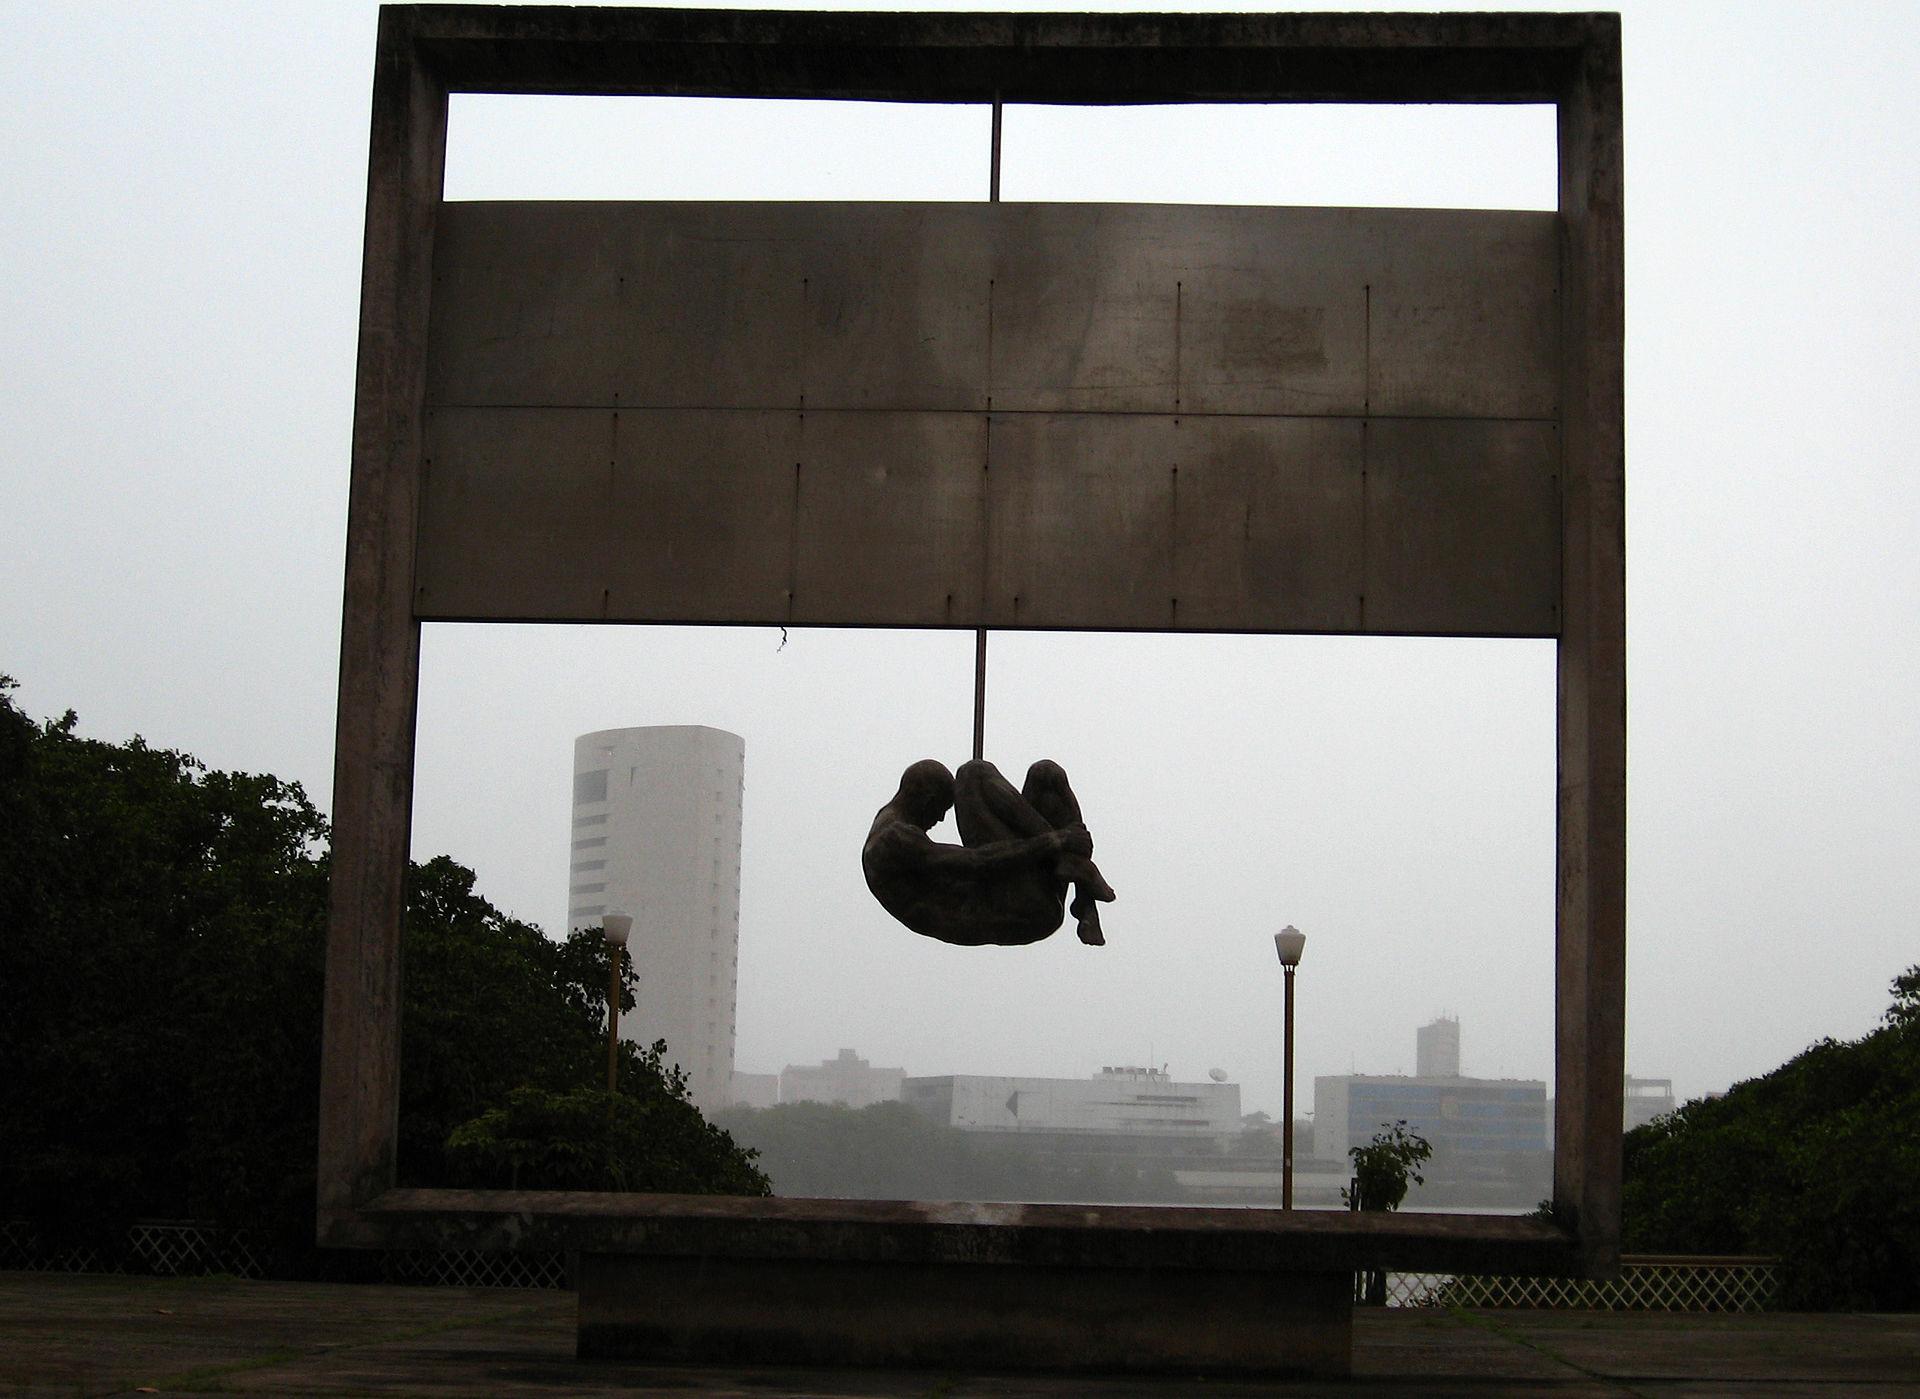 Monumento Tortura Nunca Mais, a monument by architect Demetrio Albuquerque in Recife, Brazil